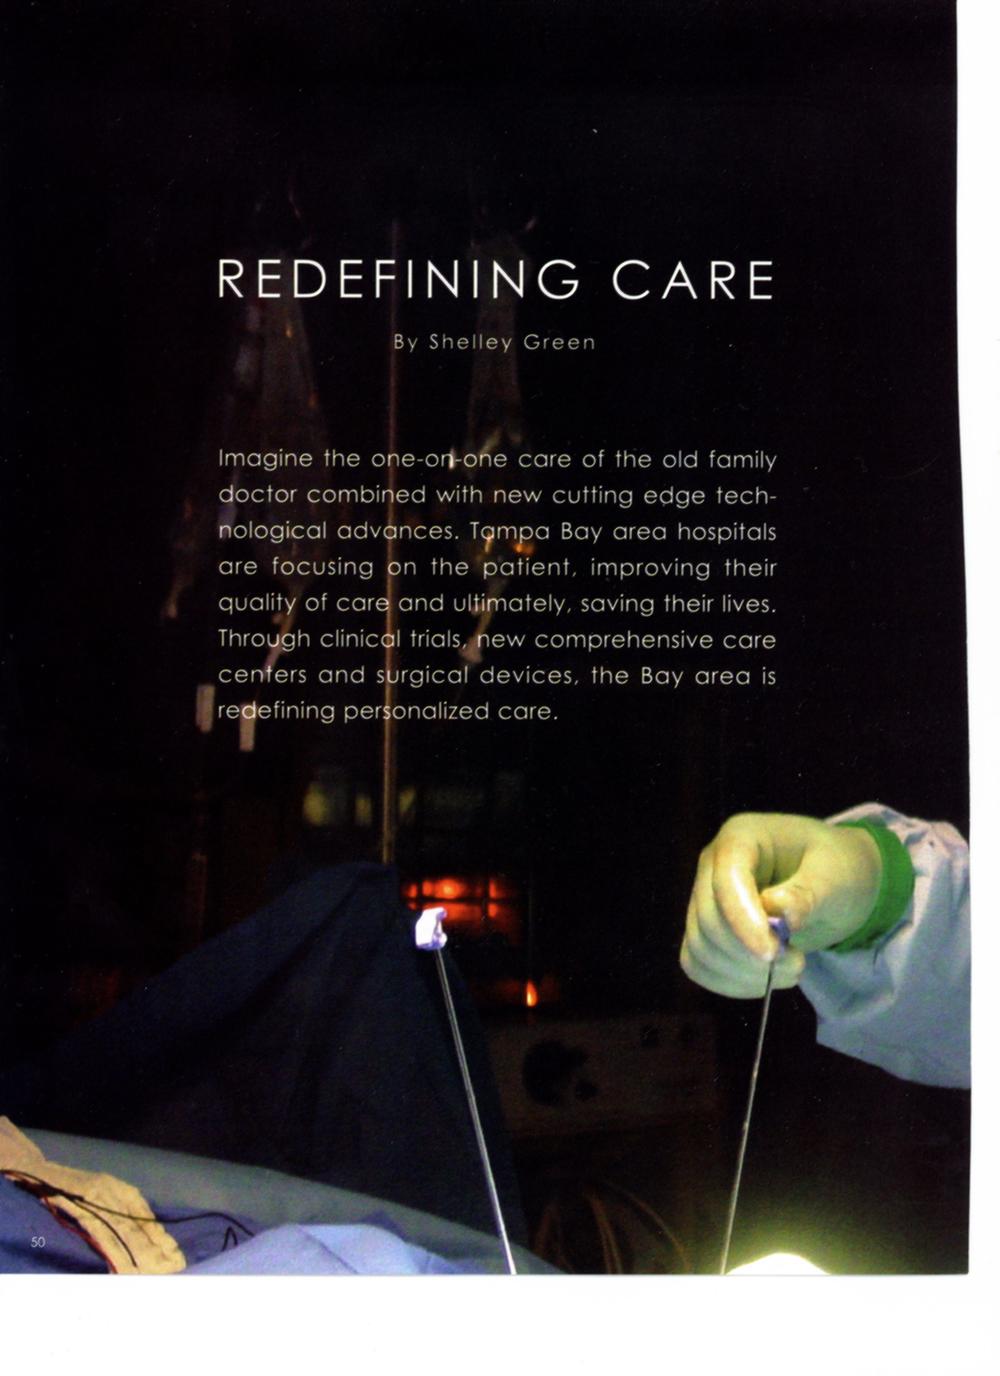 Redefining Care_1.jpg